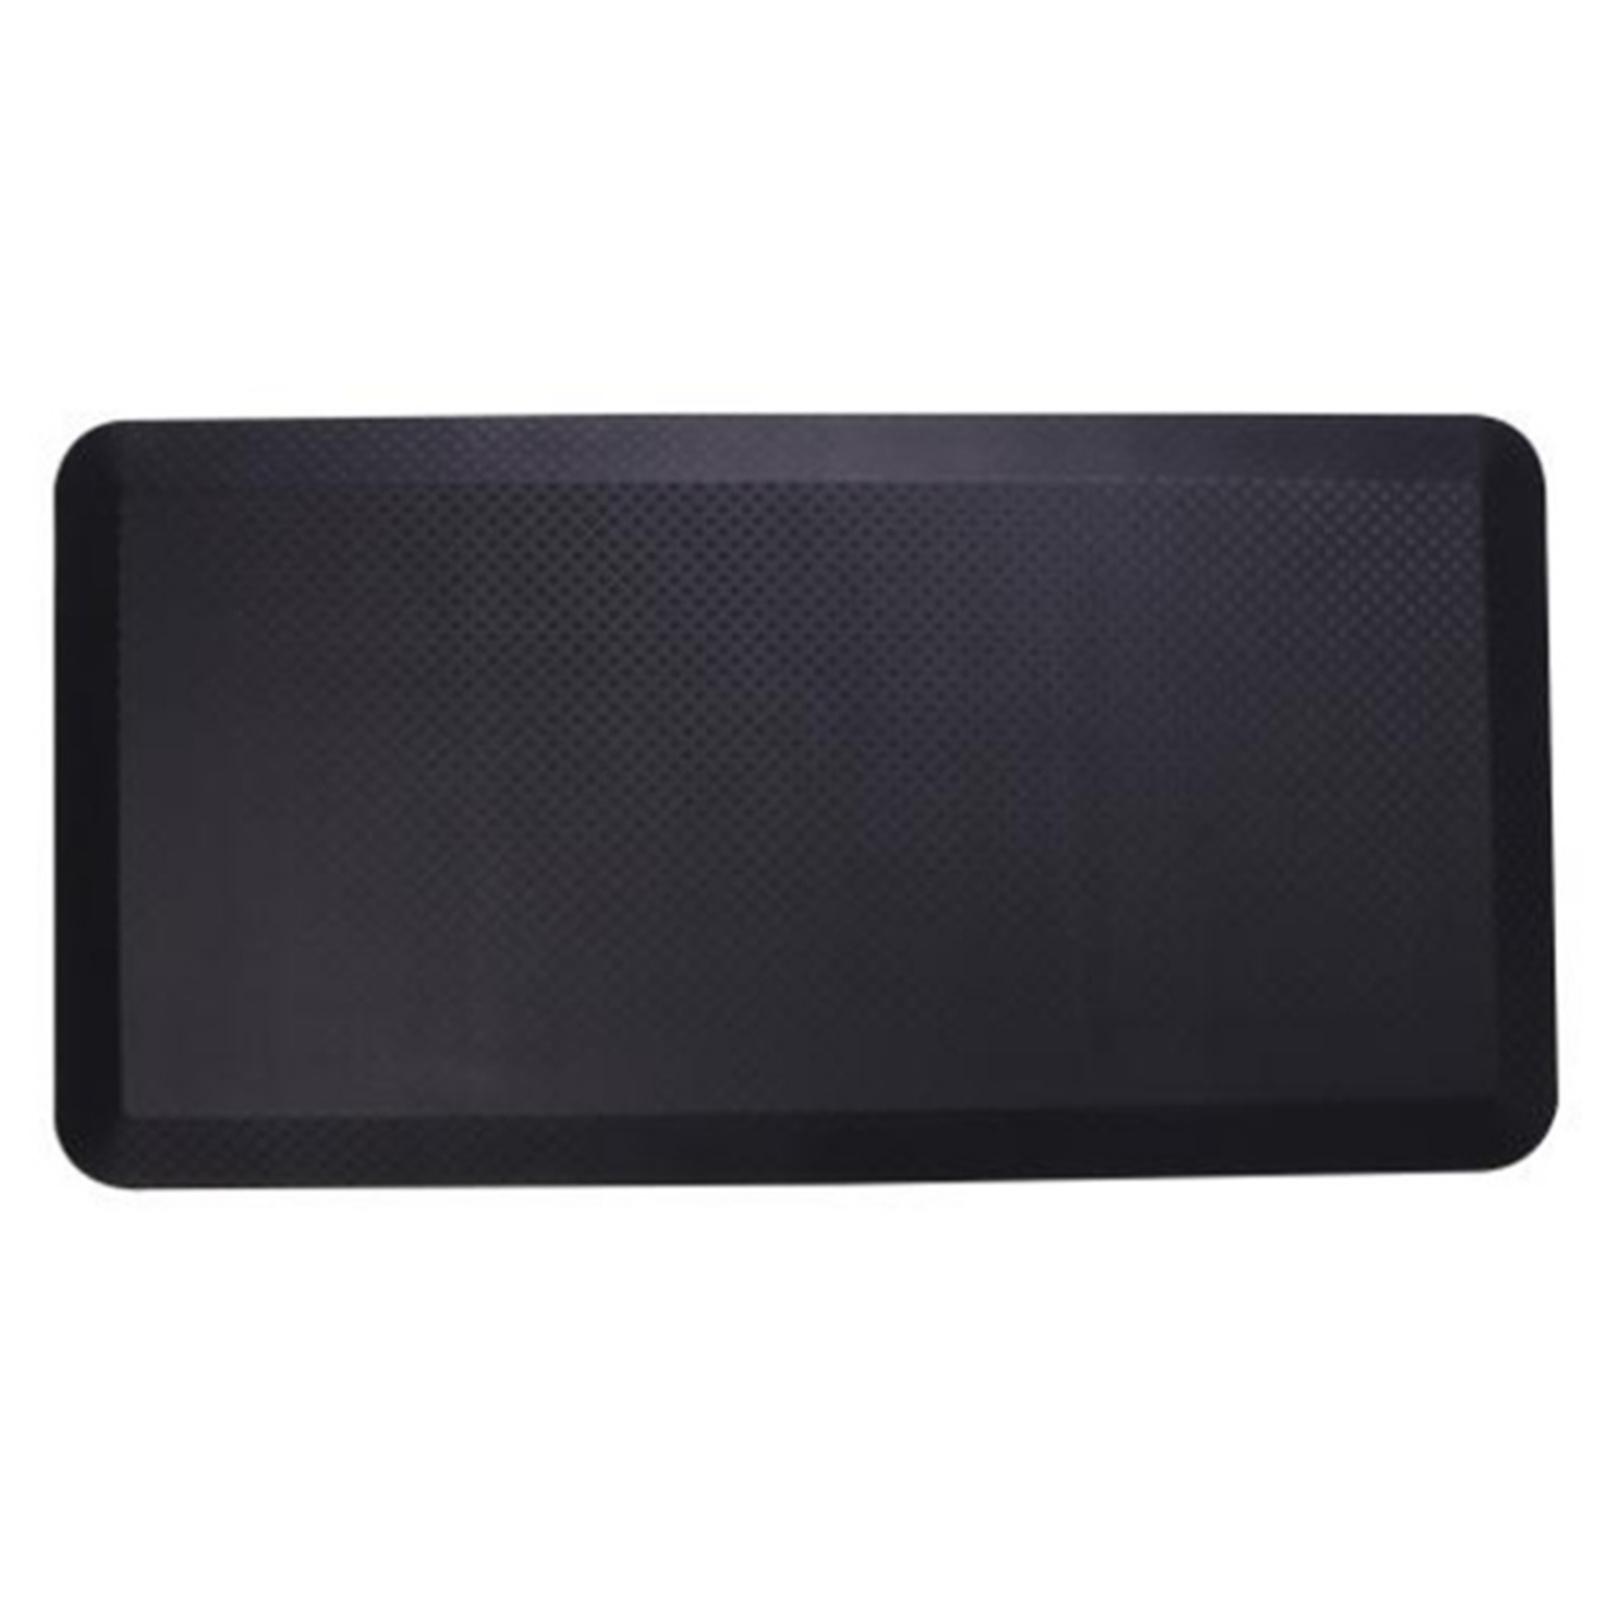 Buy The Loctek Ma13 60x90cm Ergonomic Anti Fatigue Standing Desk Mat